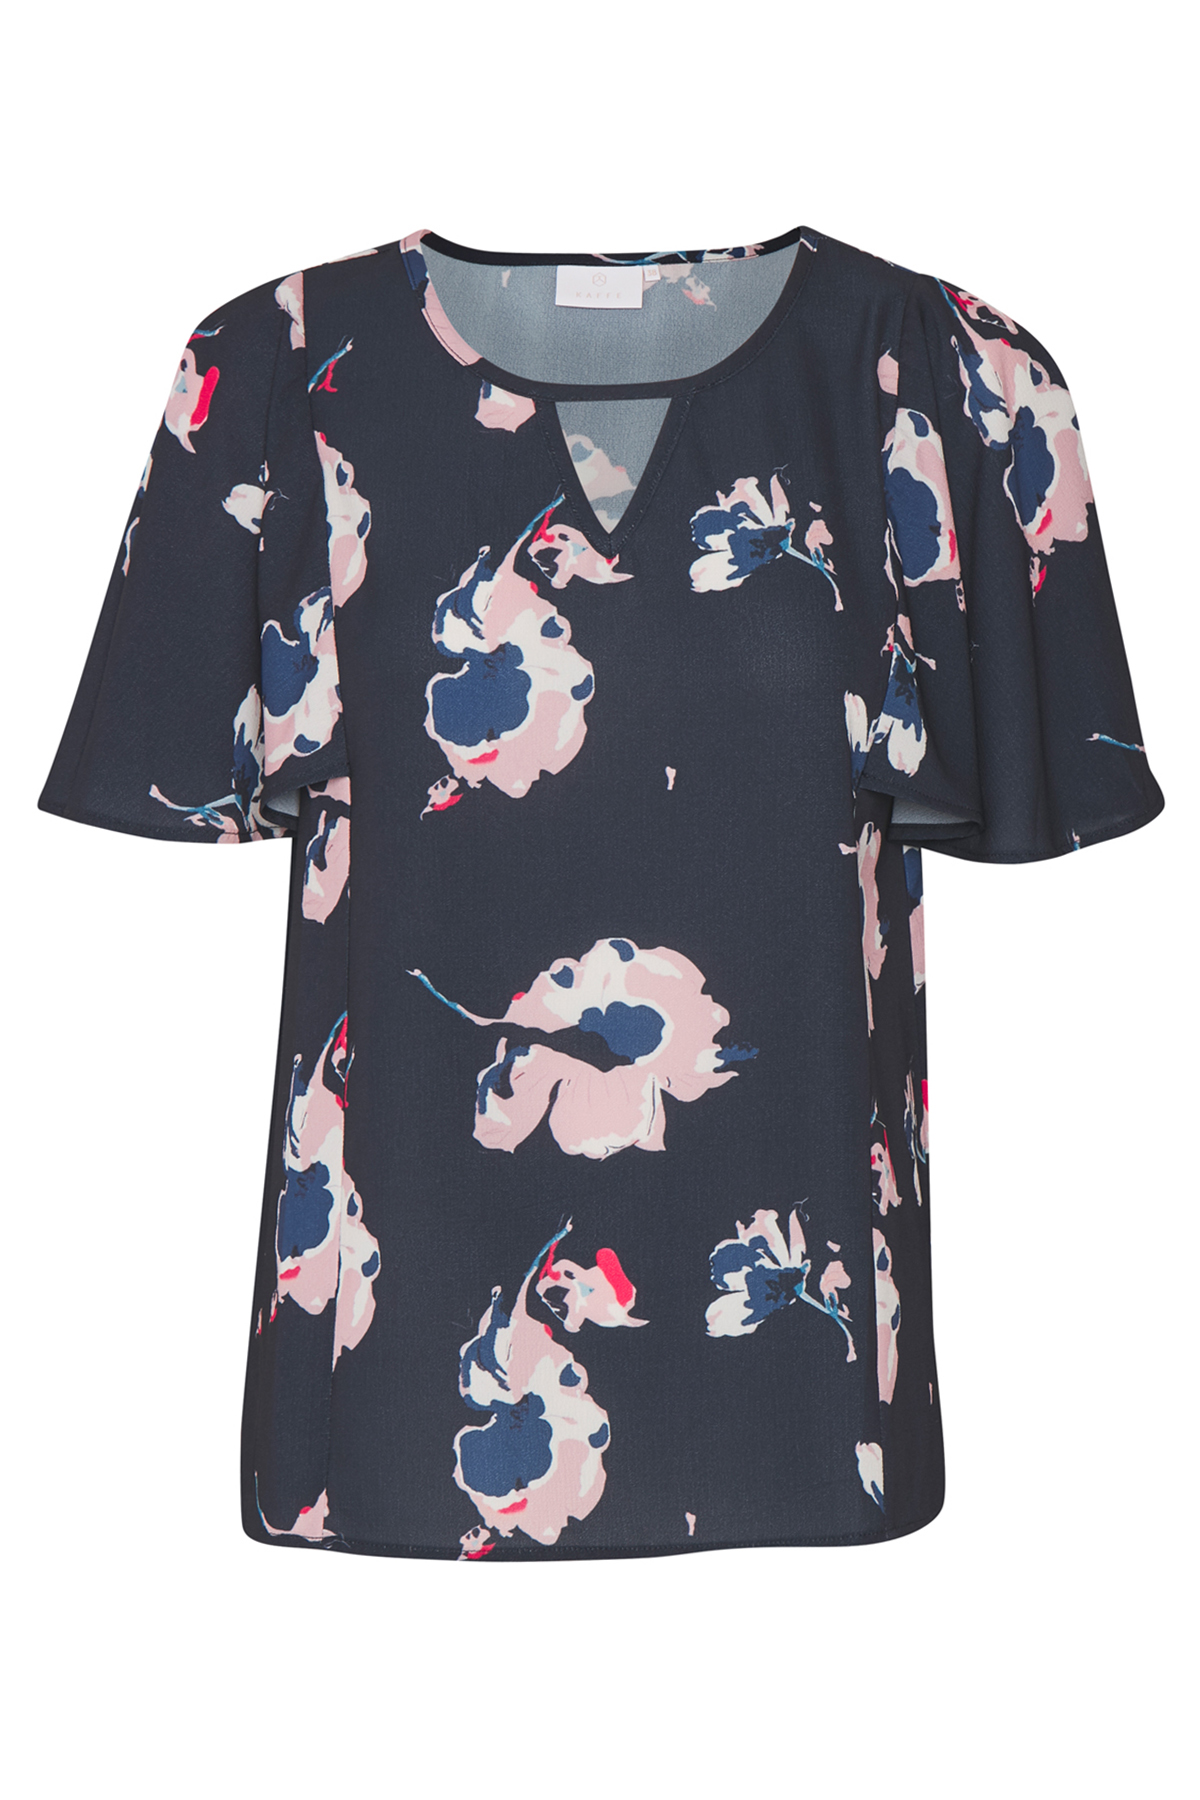 Marineblau/rosa Kurzarm-Bluse von Kaffe – Shoppen SieMarineblau/rosa Kurzarm-Bluse ab Gr. 34-46 hier